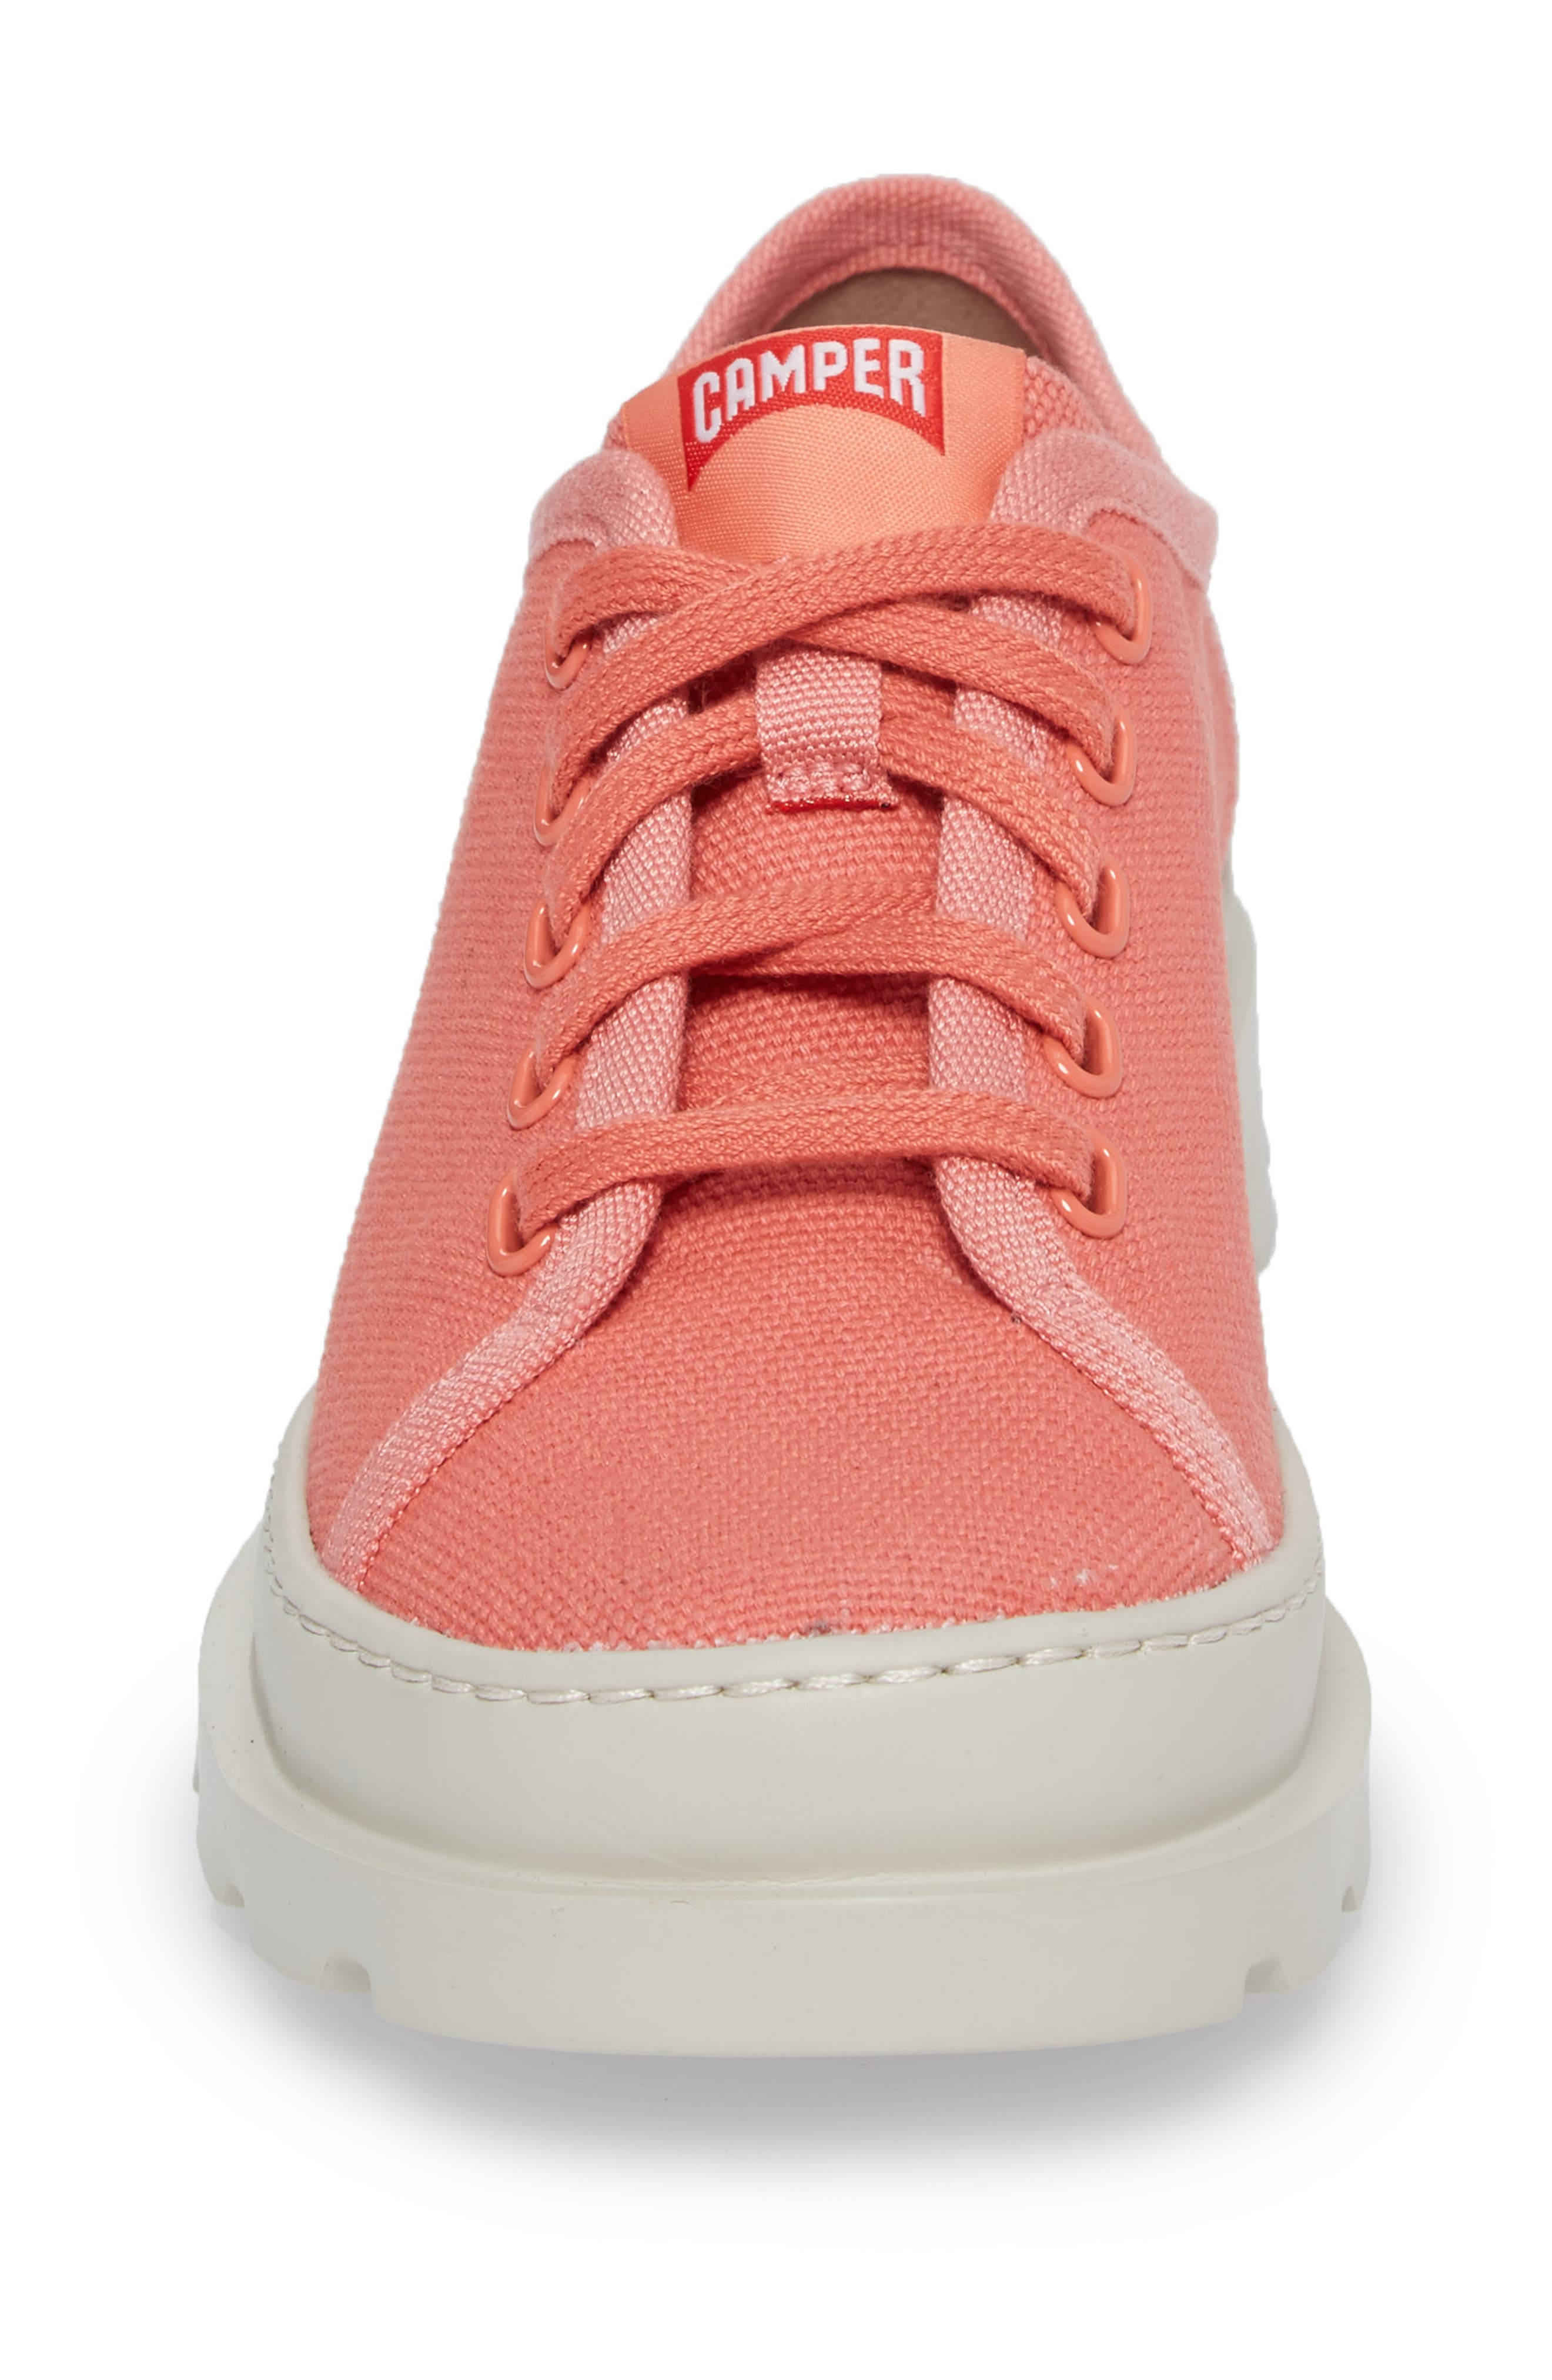 Brutus Lugged Platform Sneaker,                             Alternate thumbnail 4, color,                             PINK